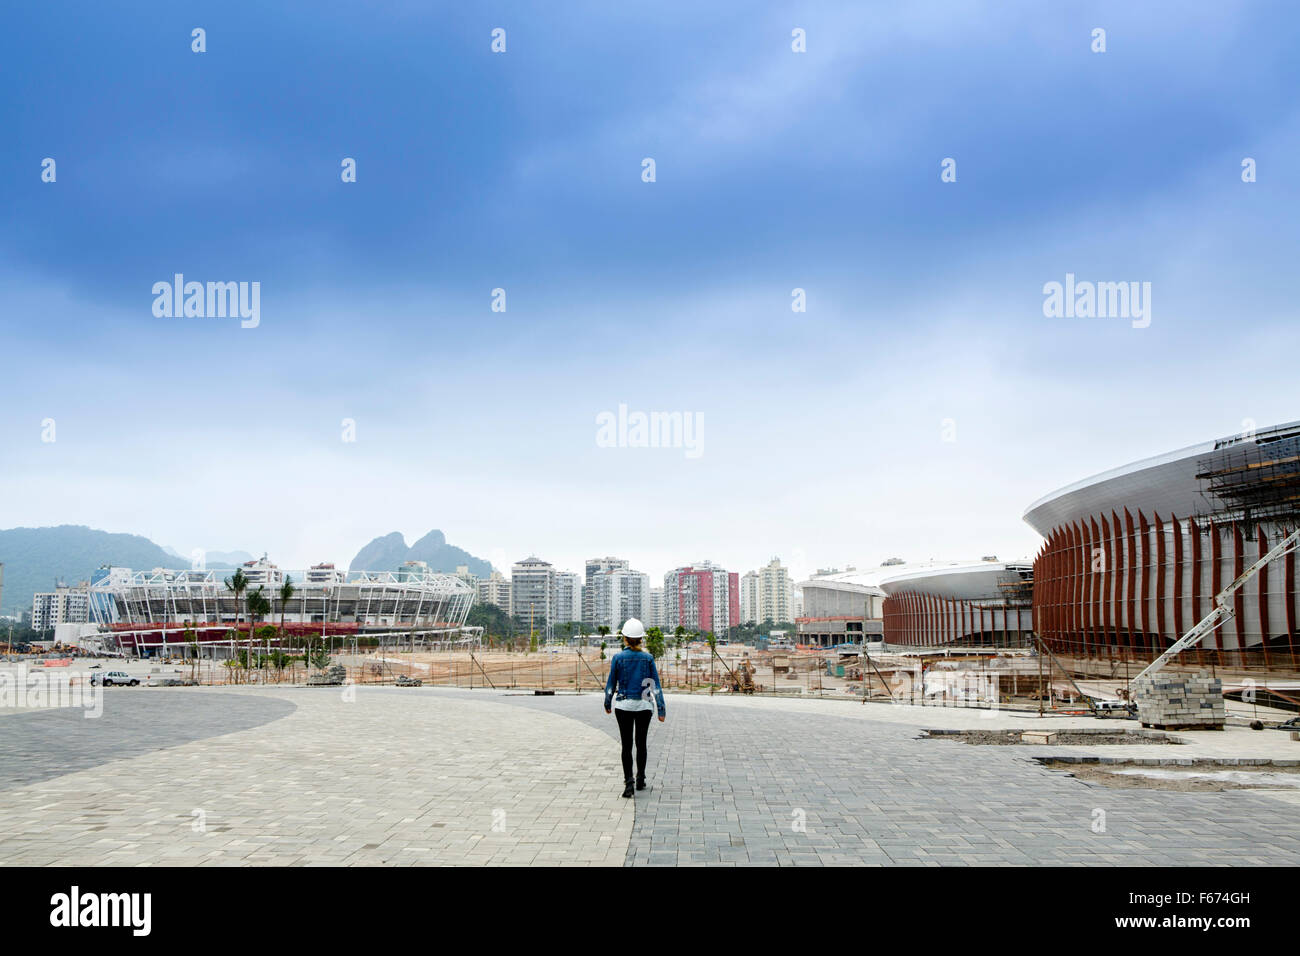 Rio de Janeiro Olympic park in Barra da Tijuca, Rio de Janeiro - Stock Image